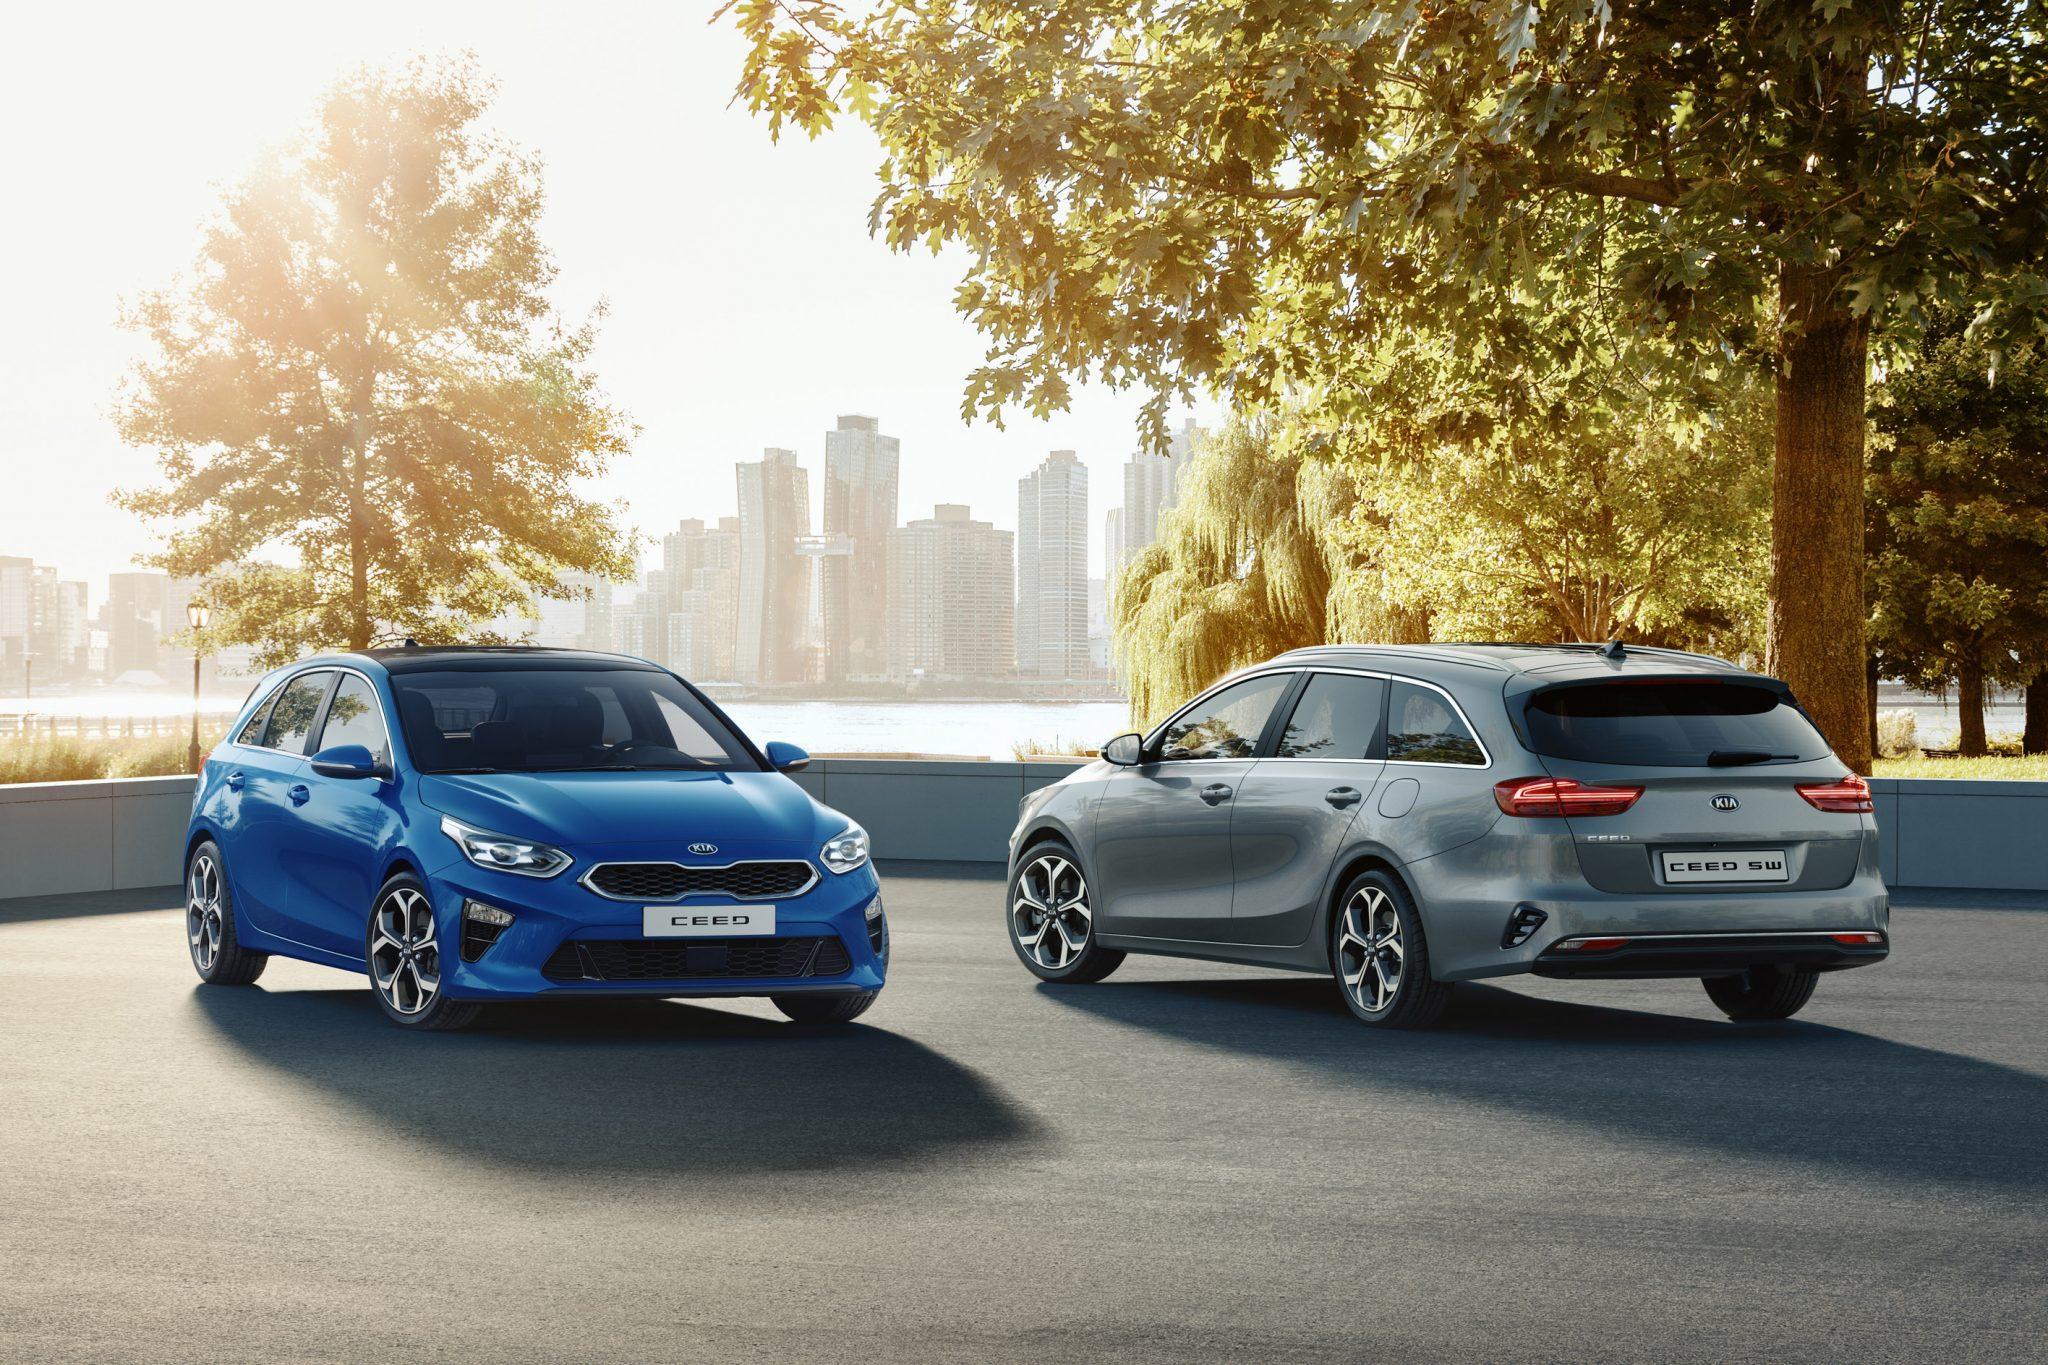 Kia Ceed / Ceed Sportswagon Auto Stahl 2019 Kombi Seitenansicht Heck Front Blau Grau City Outdoor